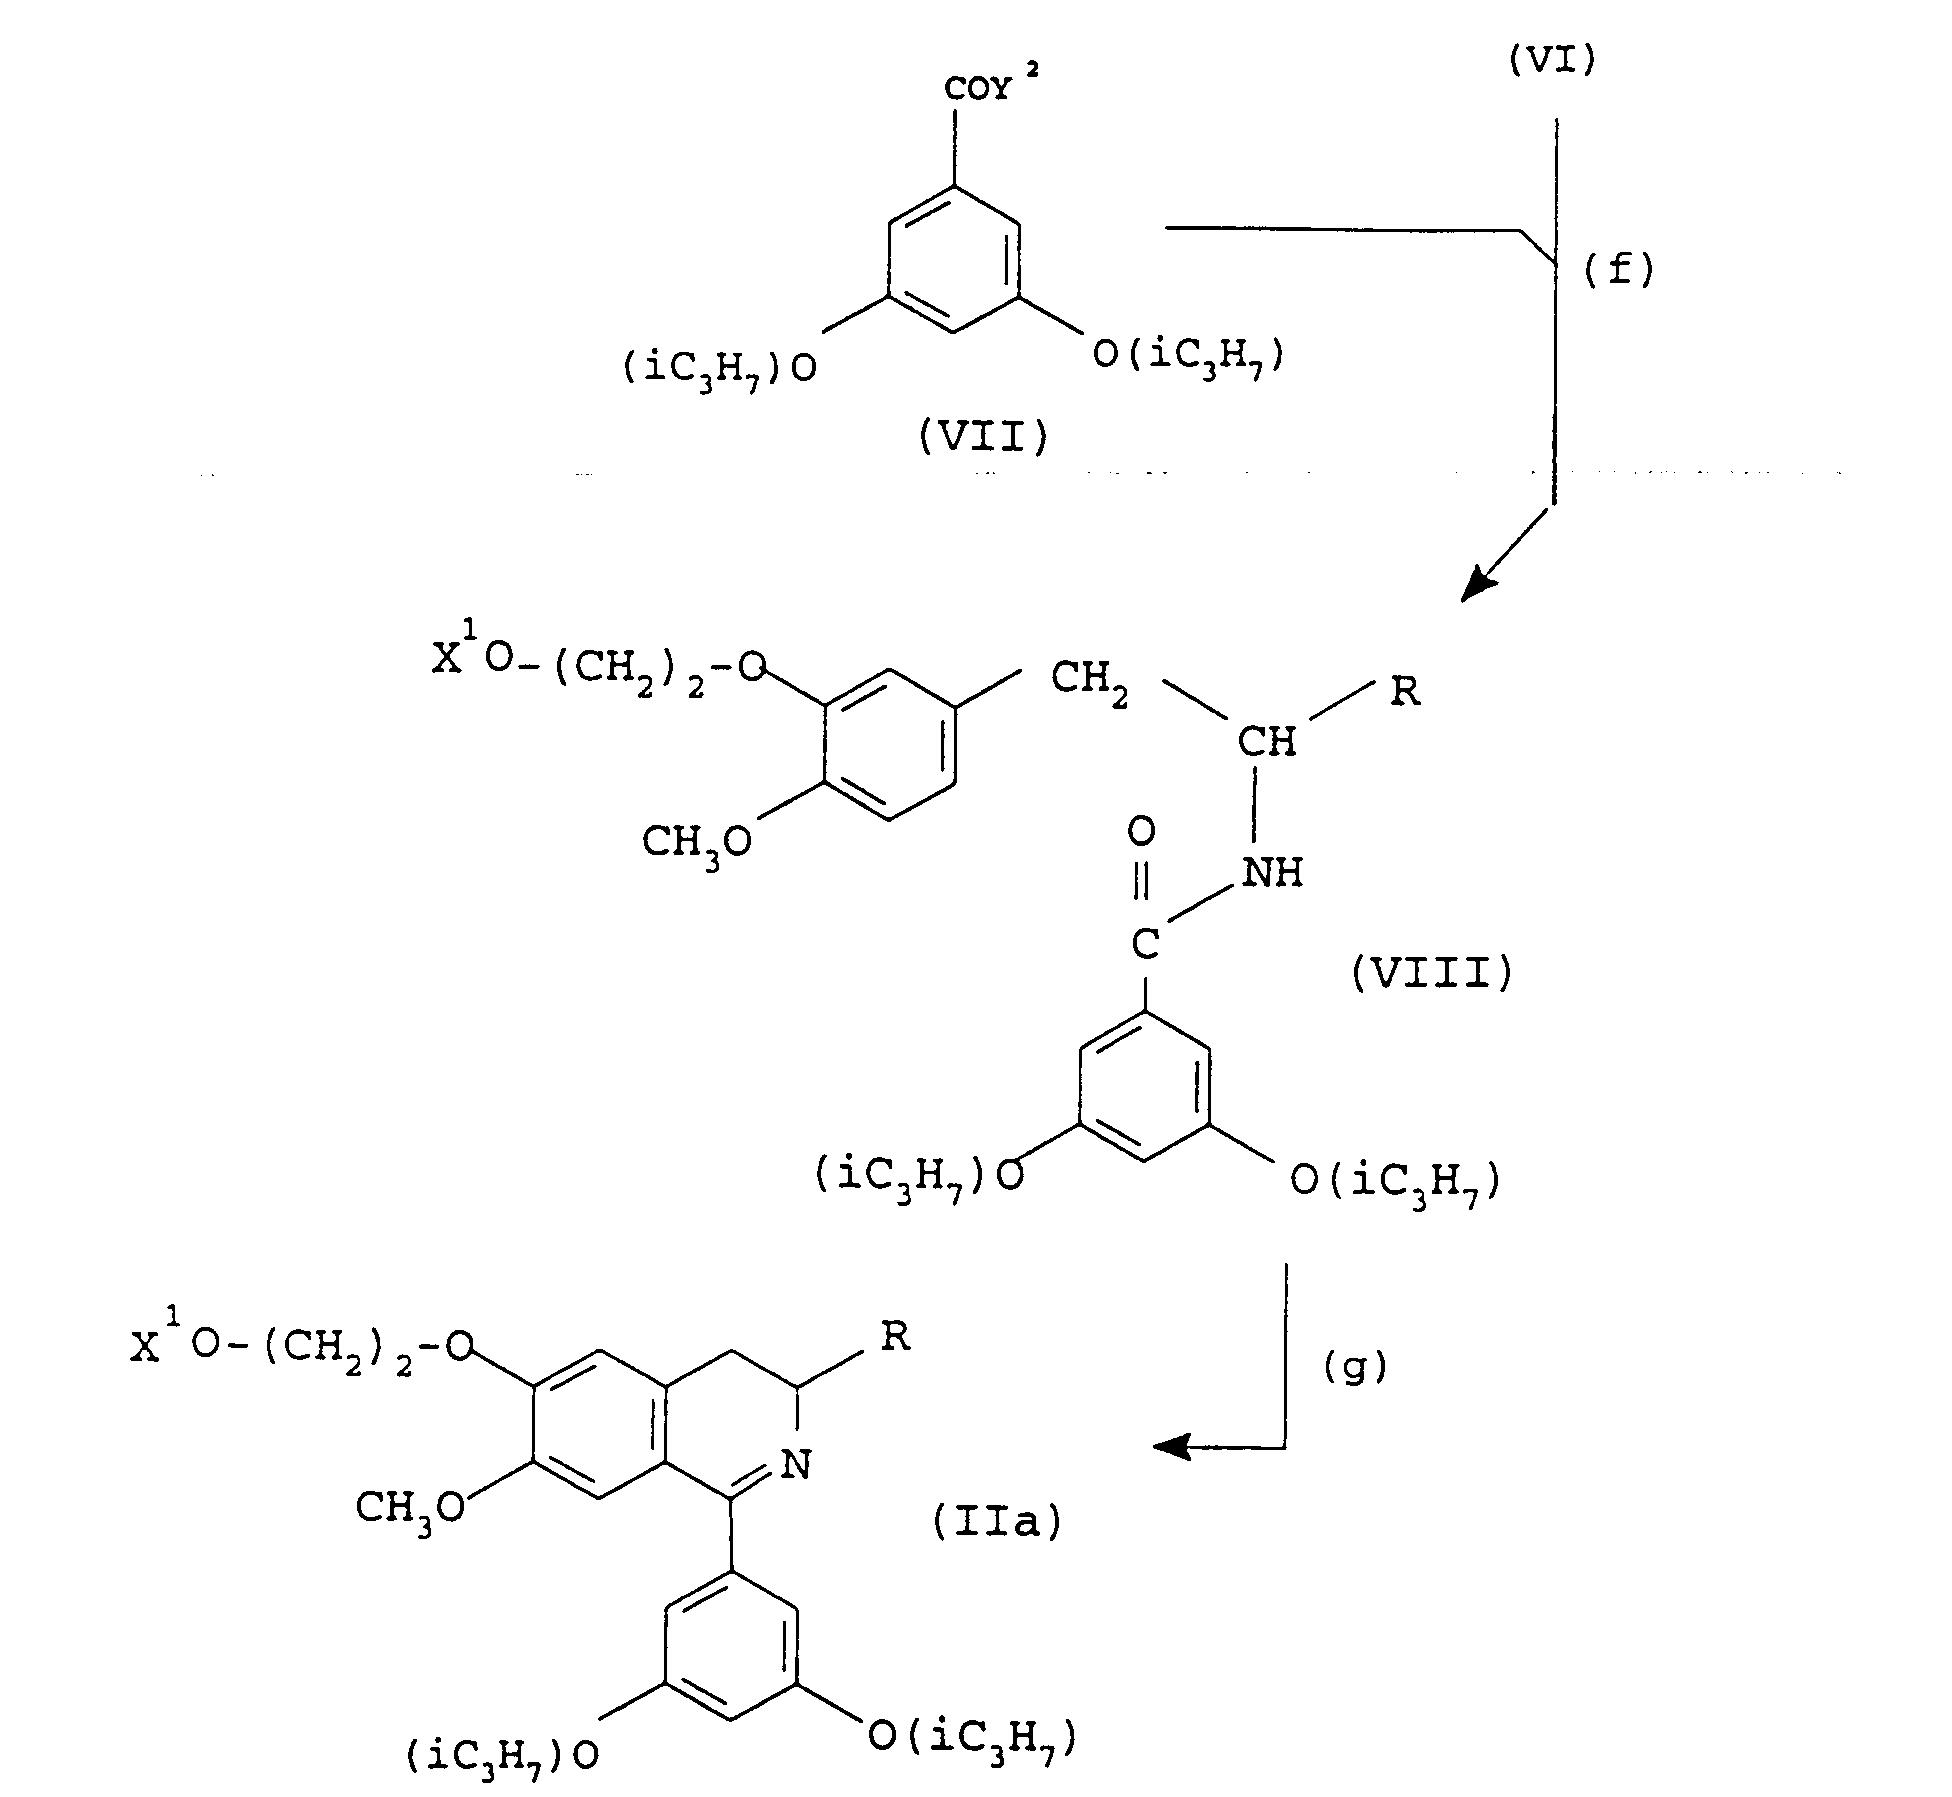 EP0664289A2 - Isoquinolines - Google Patents